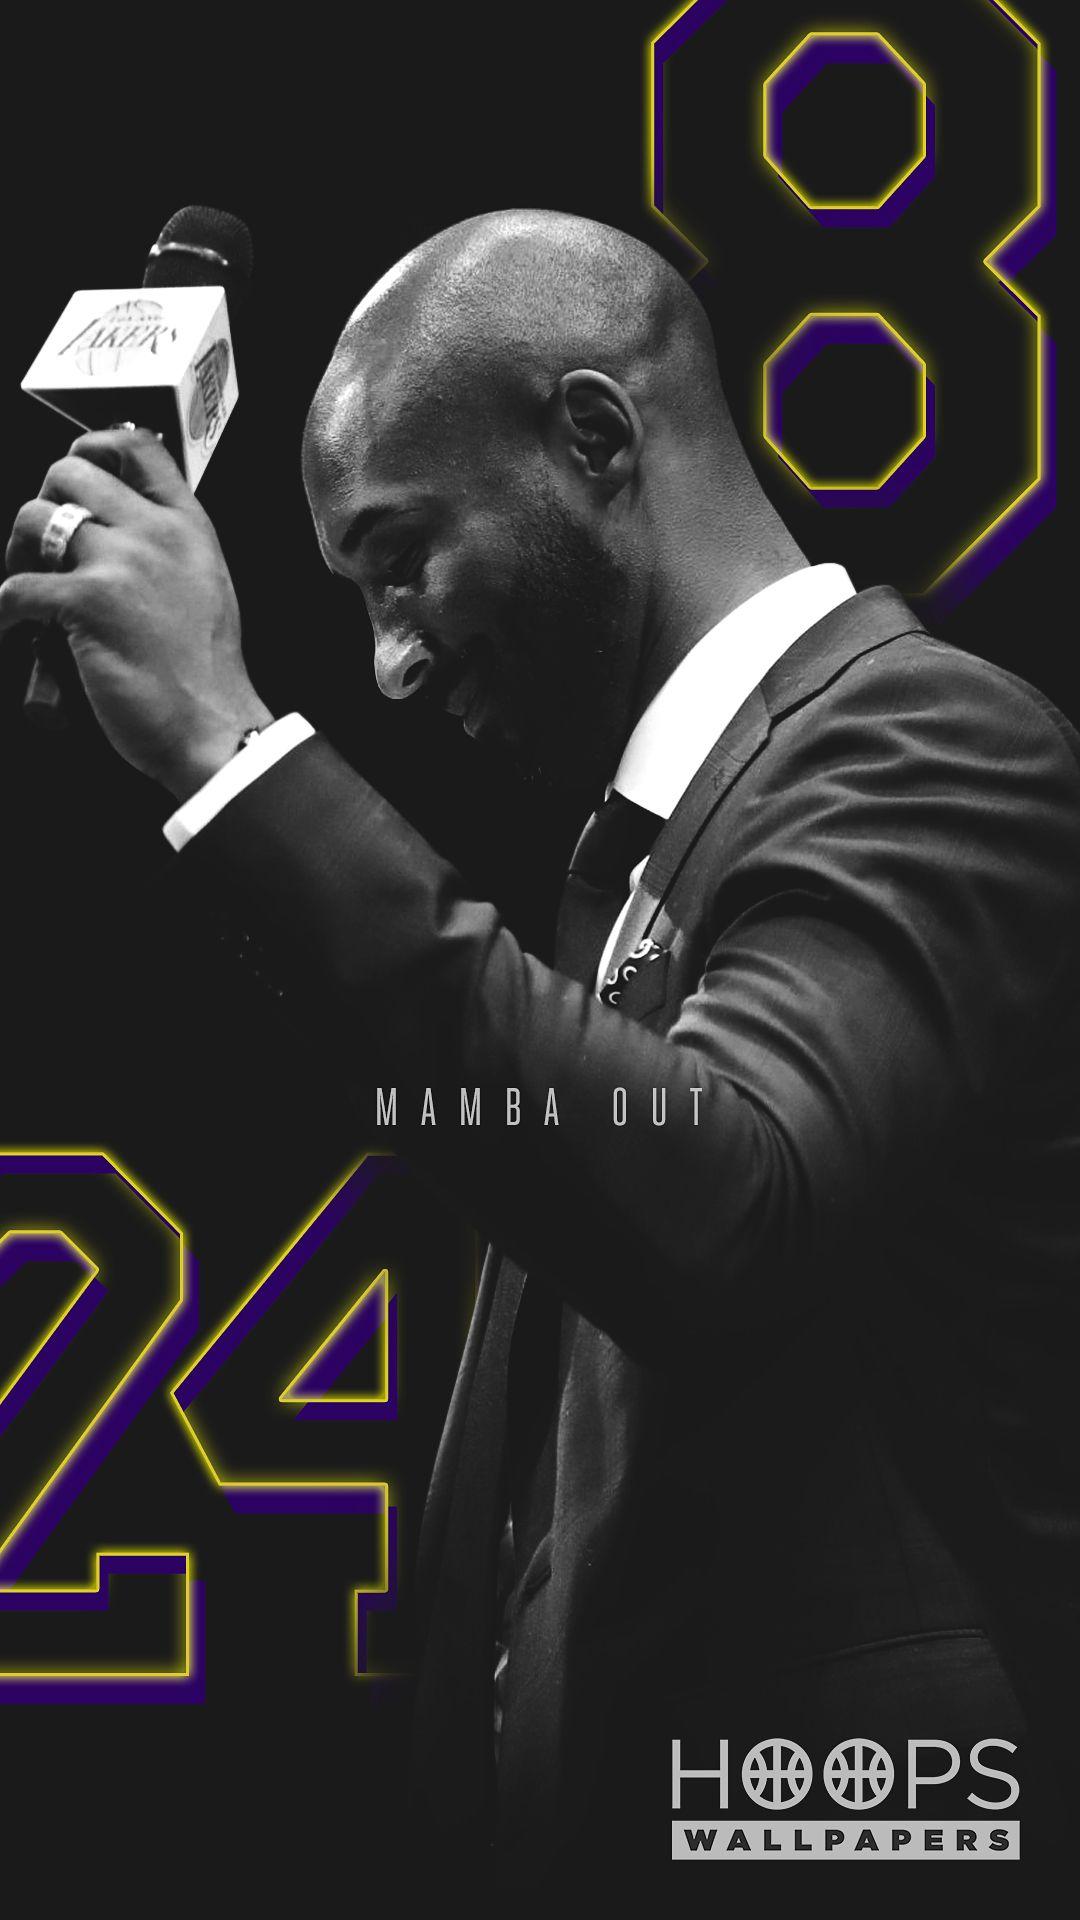 Kobe 24 Nba プレーヤー コービーブライアント バスケ 写真